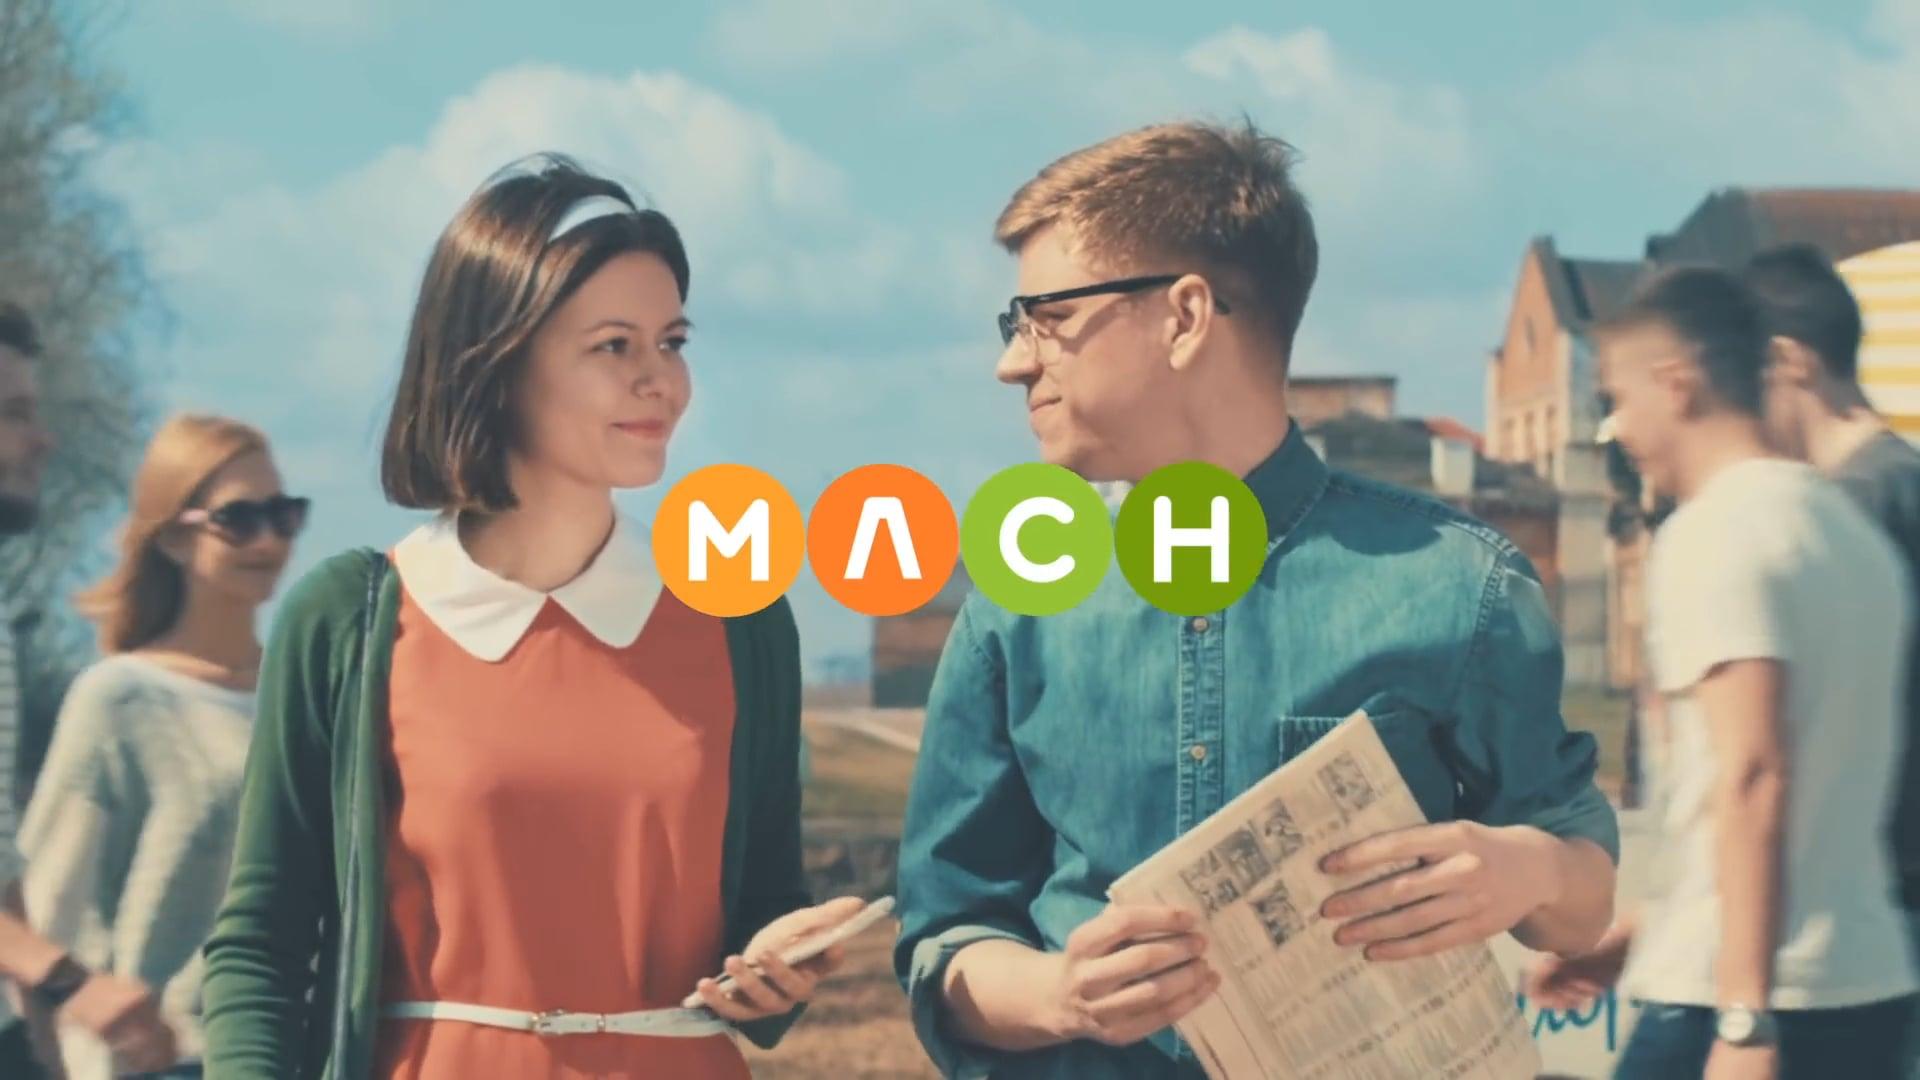 МЛСН | TV SPOT